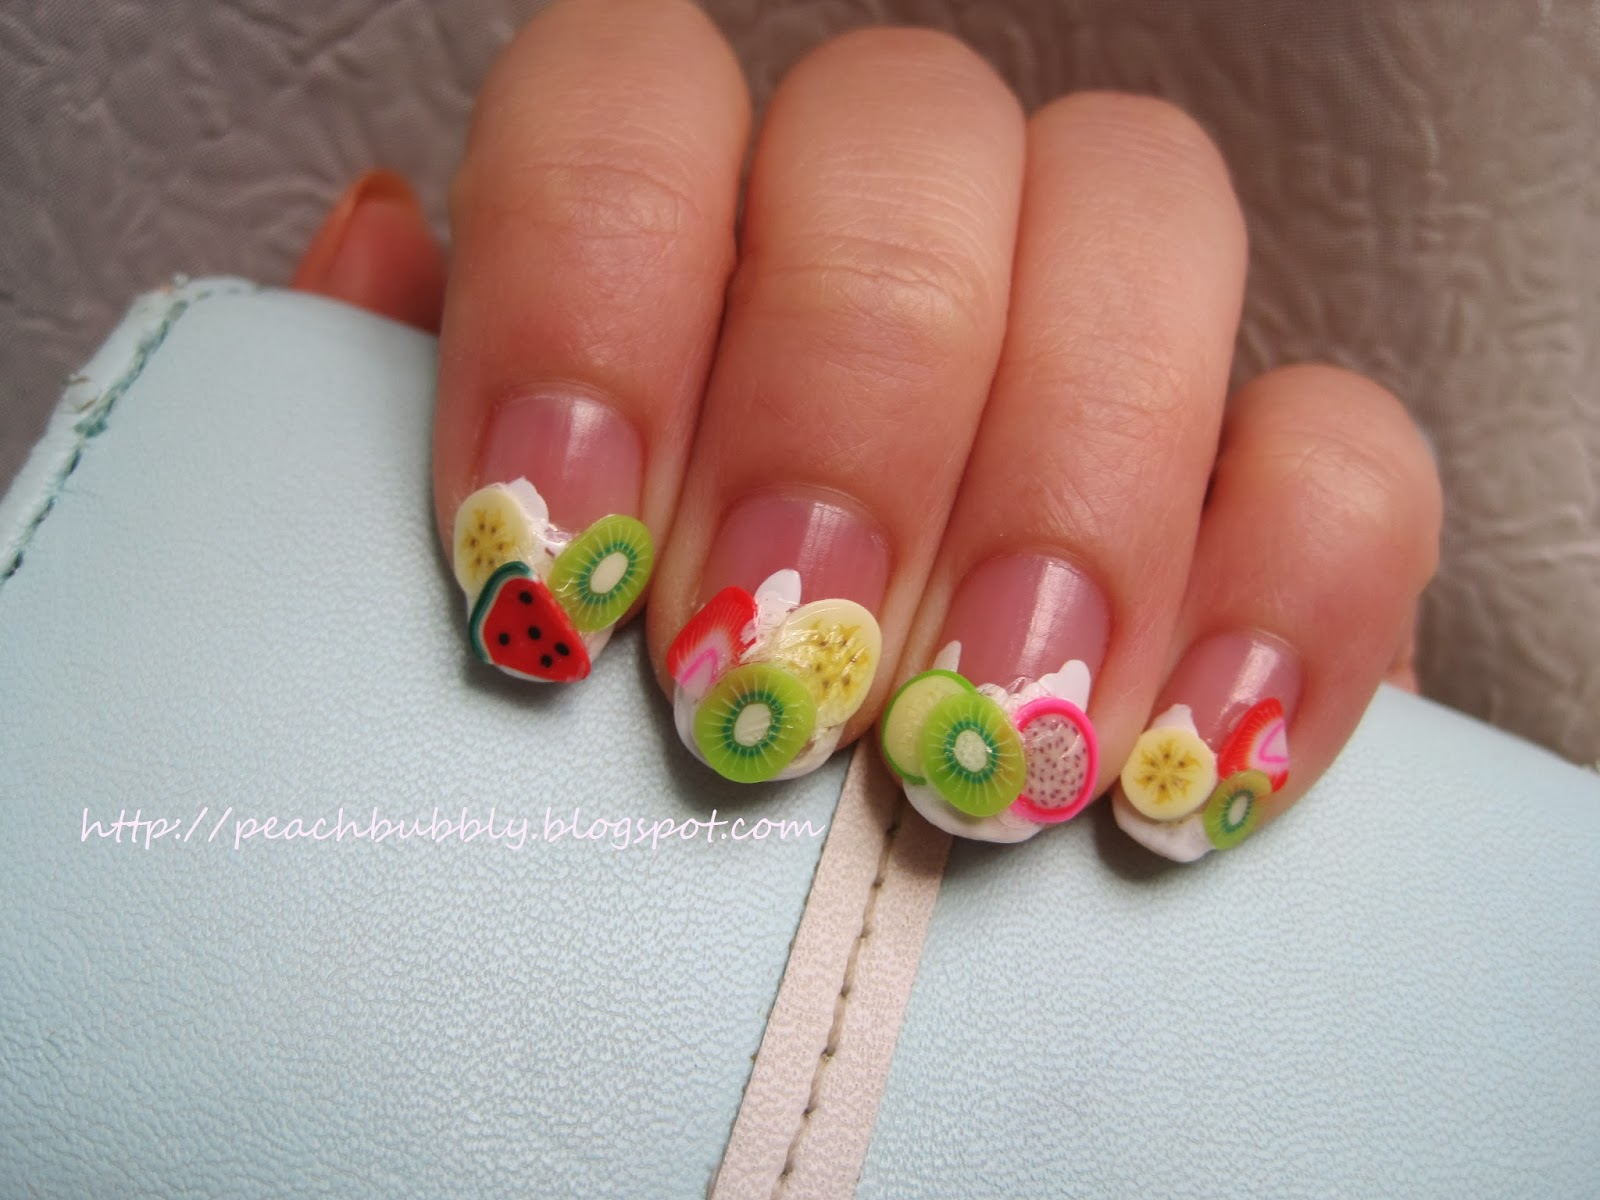 peachbubbly: Fimo Fruit Slices on Yogurt Nail Art